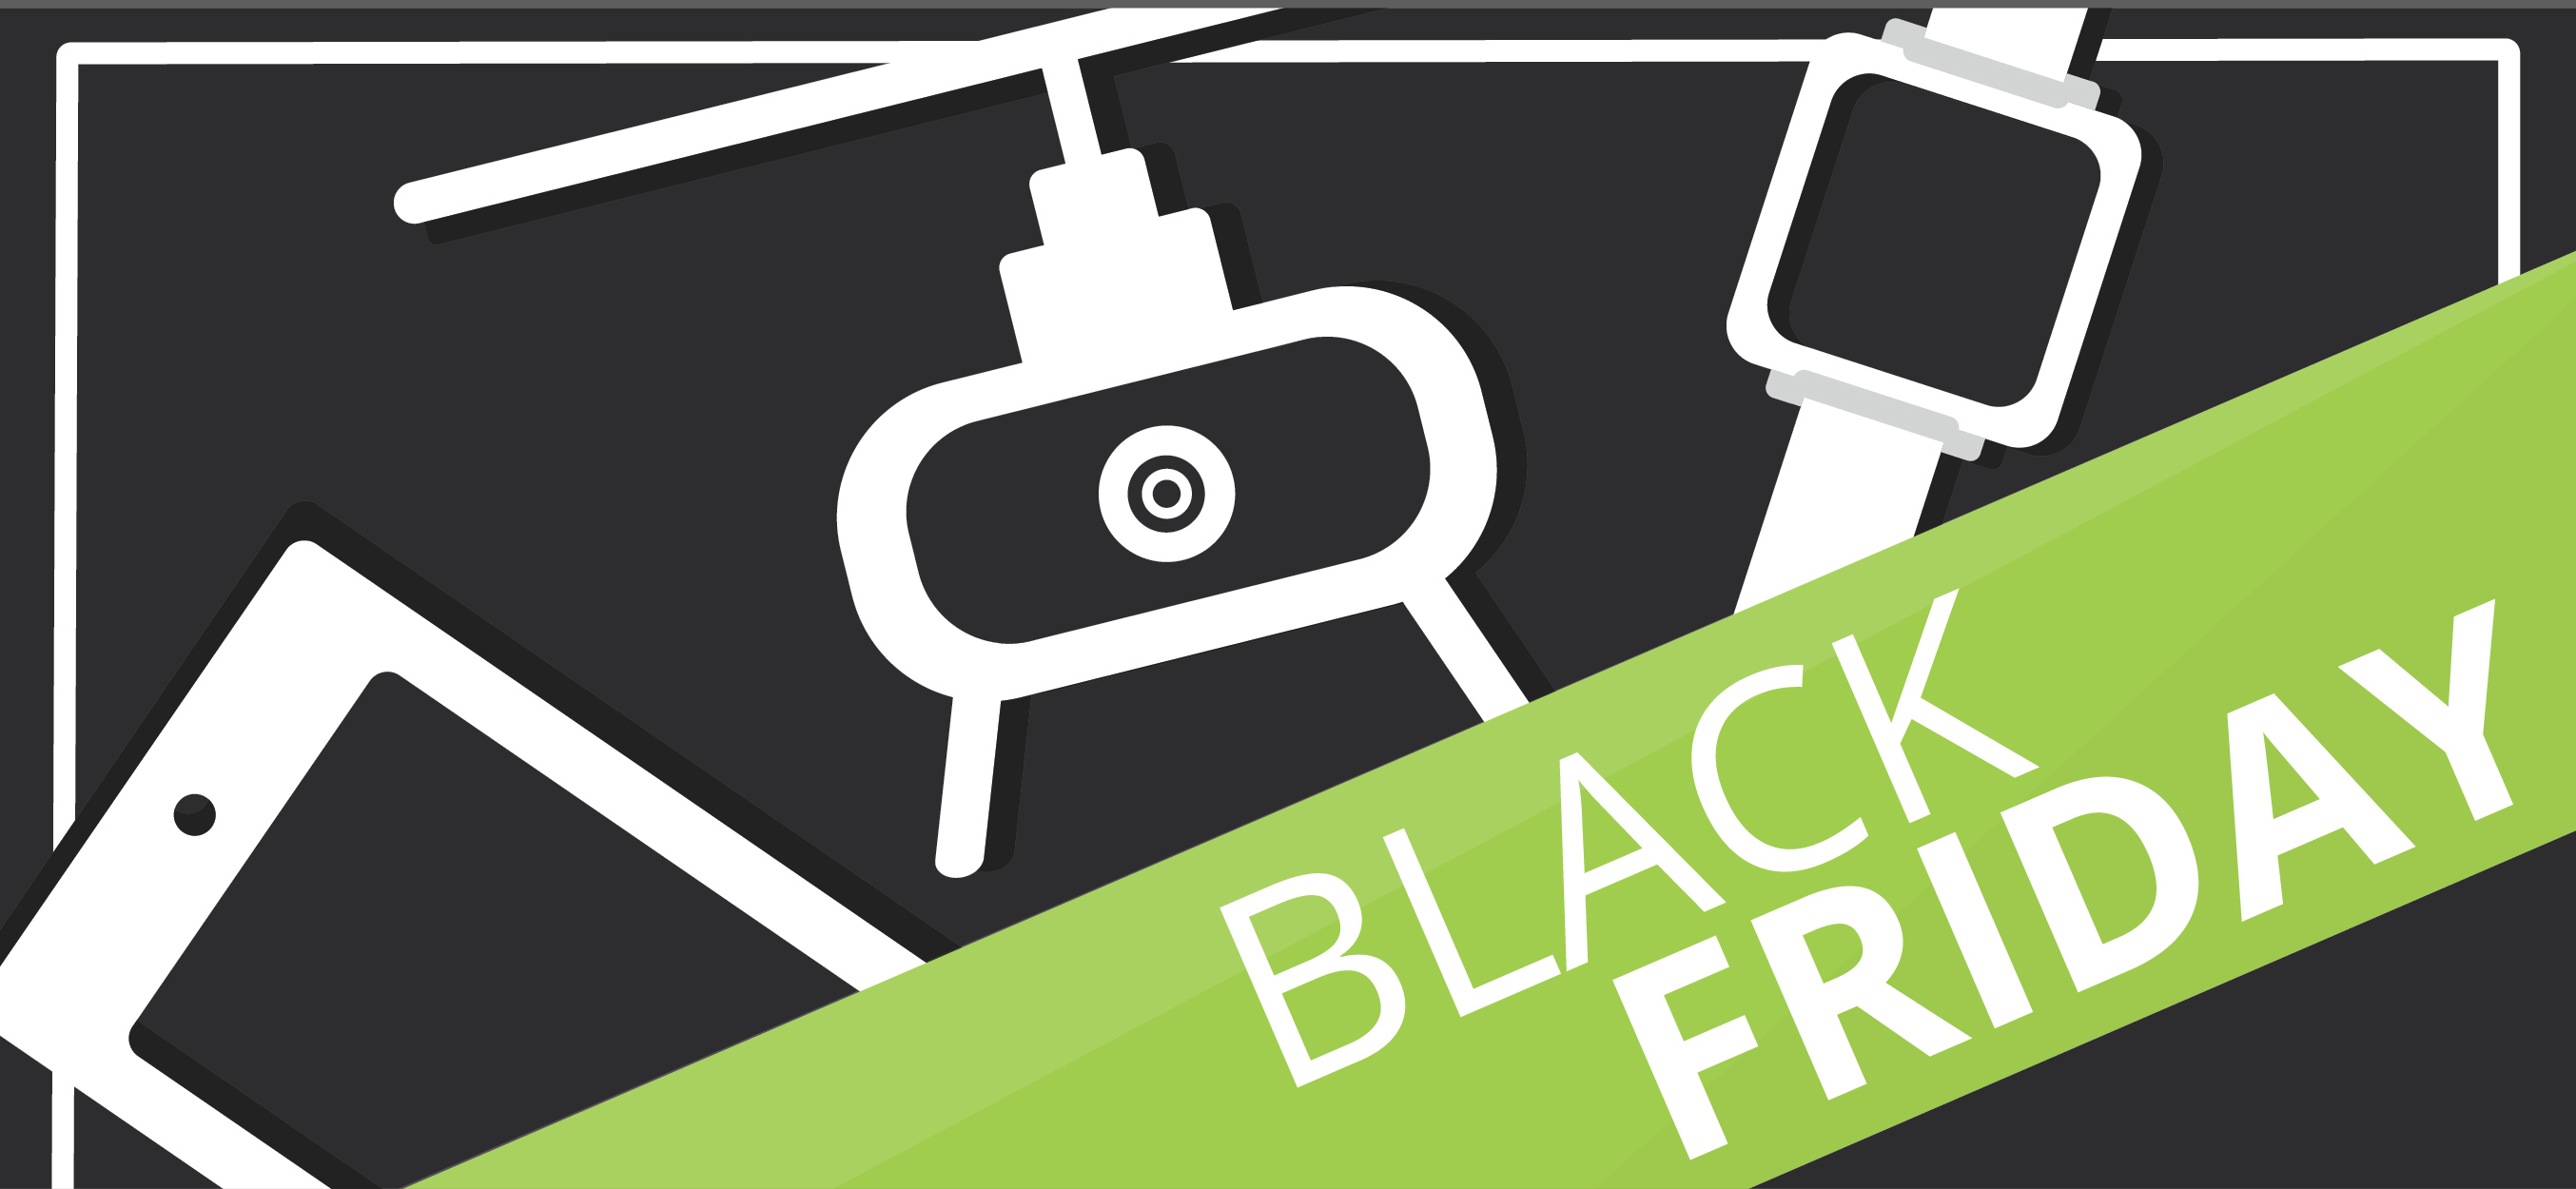 blackfriday 2016 toutes les offres et bons plans frandroid. Black Bedroom Furniture Sets. Home Design Ideas